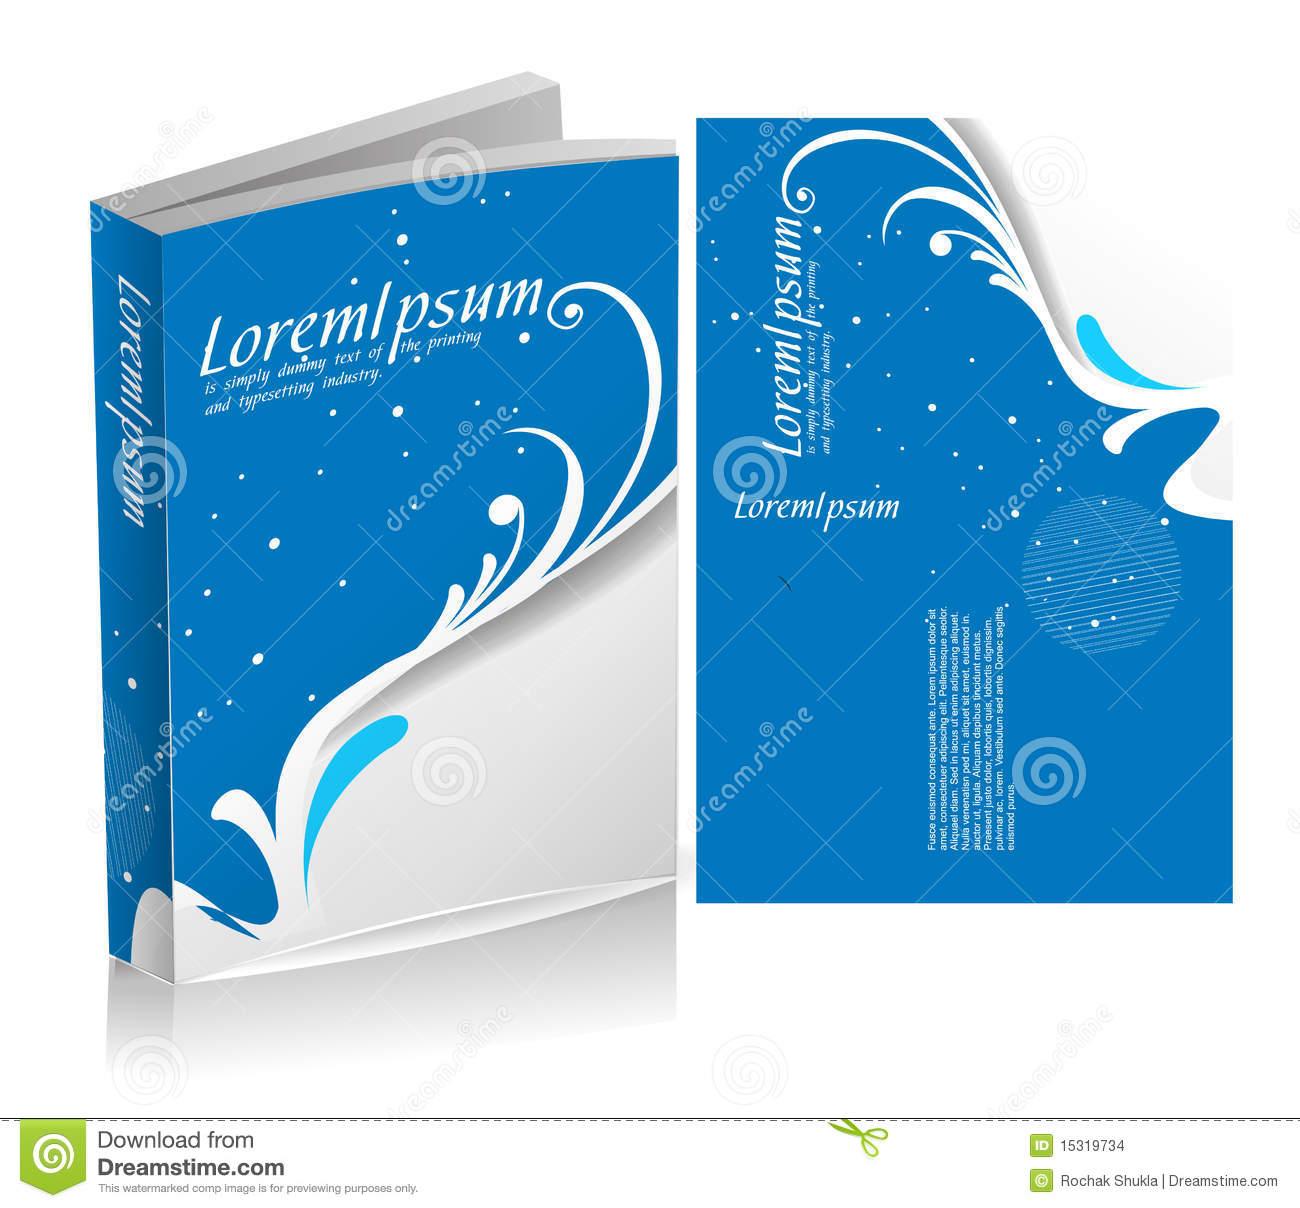 Floral book cover design stock vector. Illustration of floral.